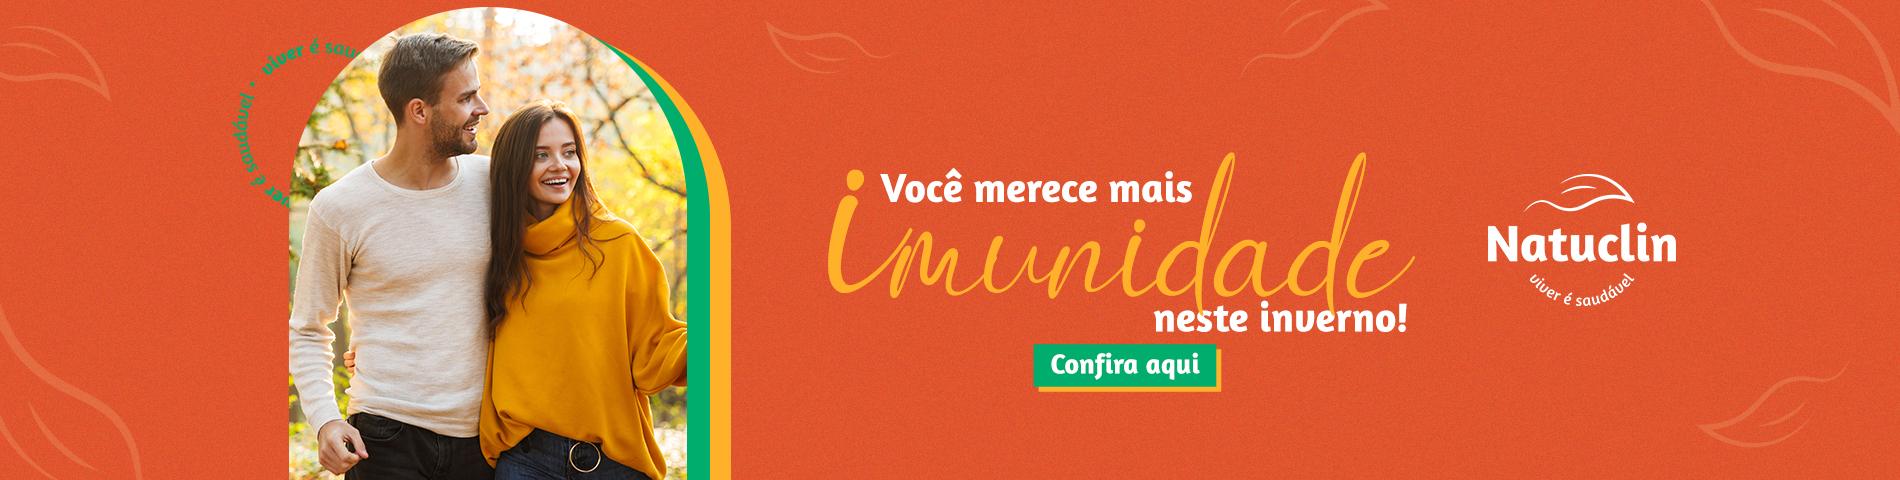 Banner - Campanha Imunidade